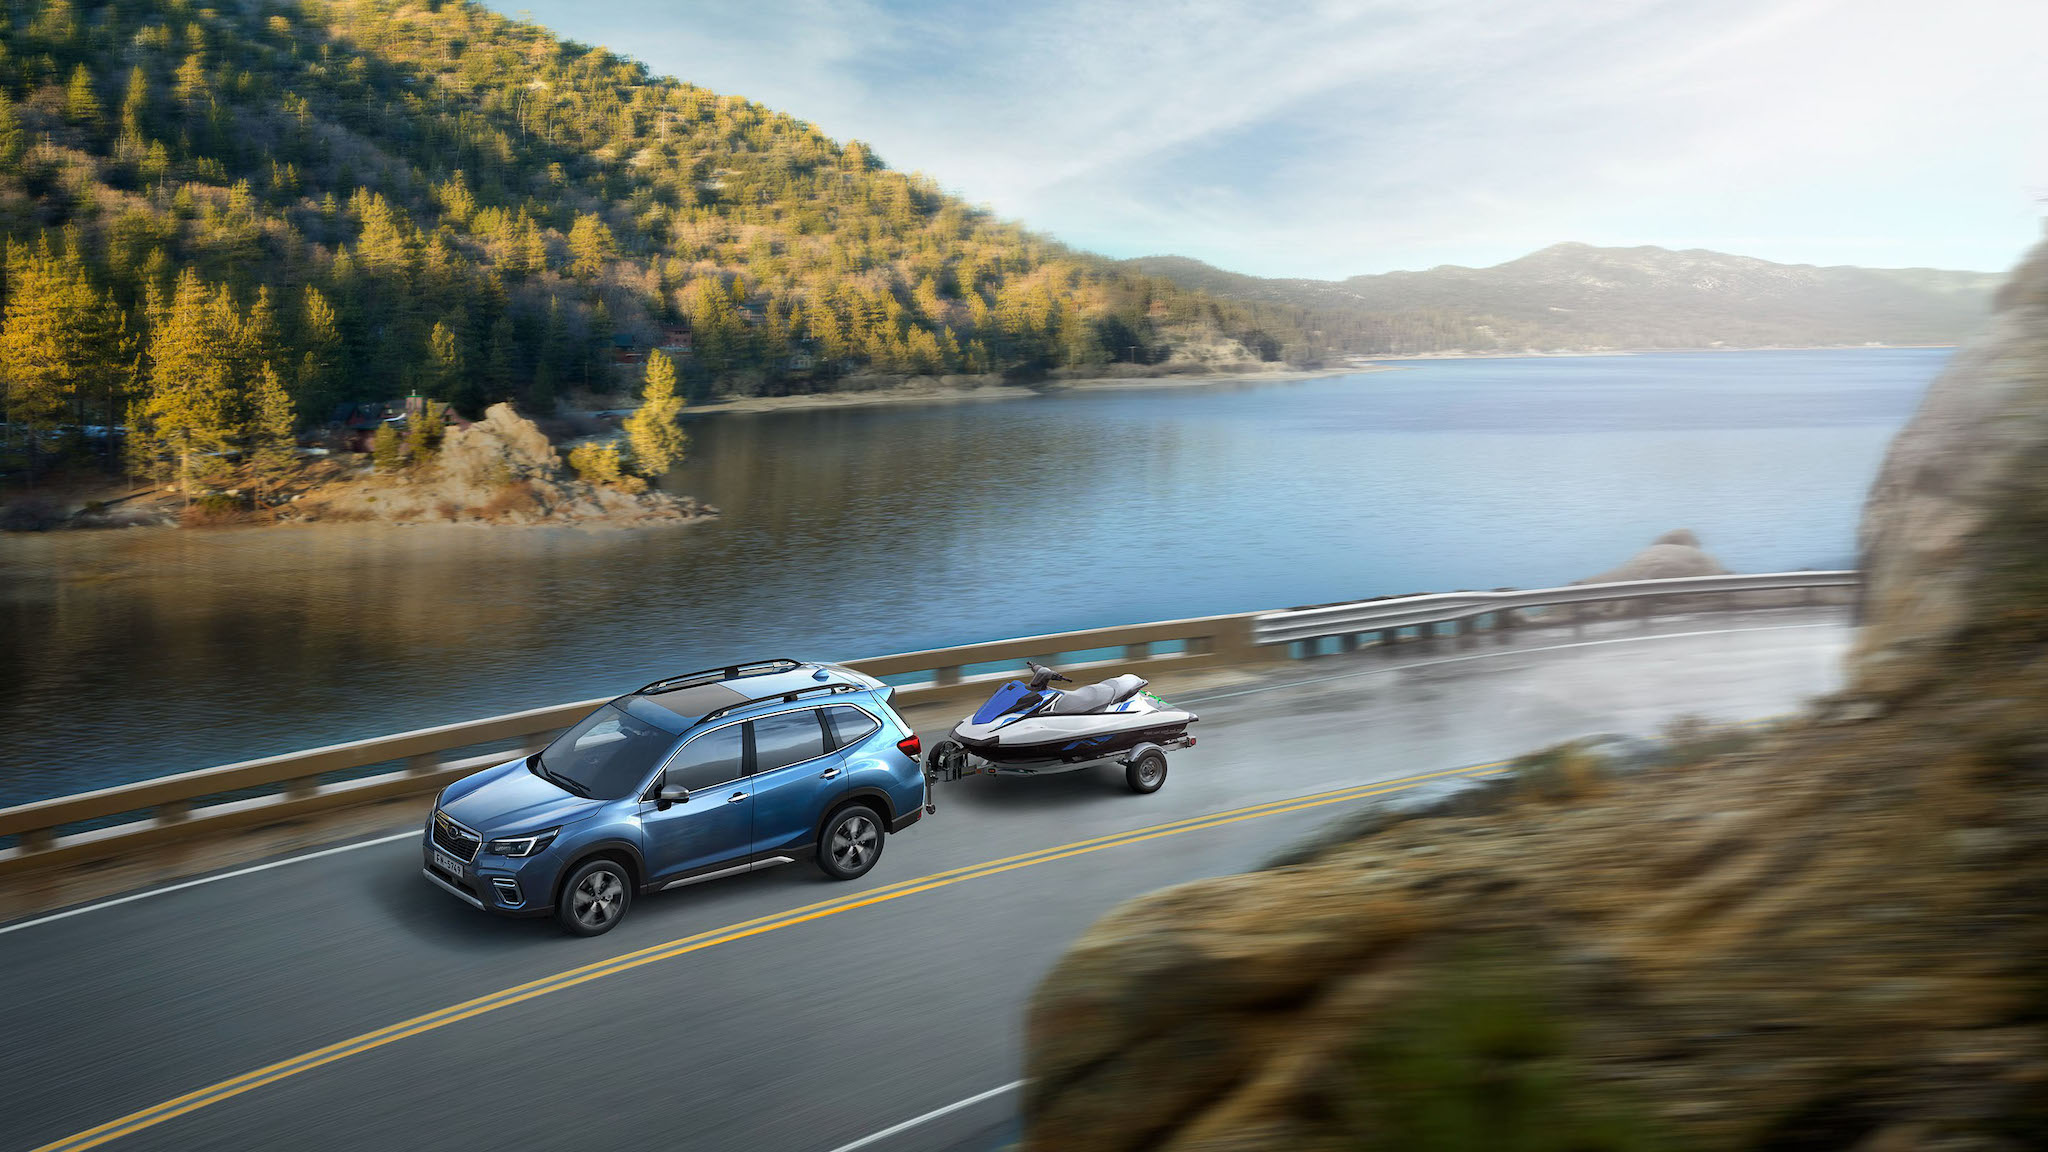 21 年式 Subaru Forester / XV 105.8 萬起預售開跑